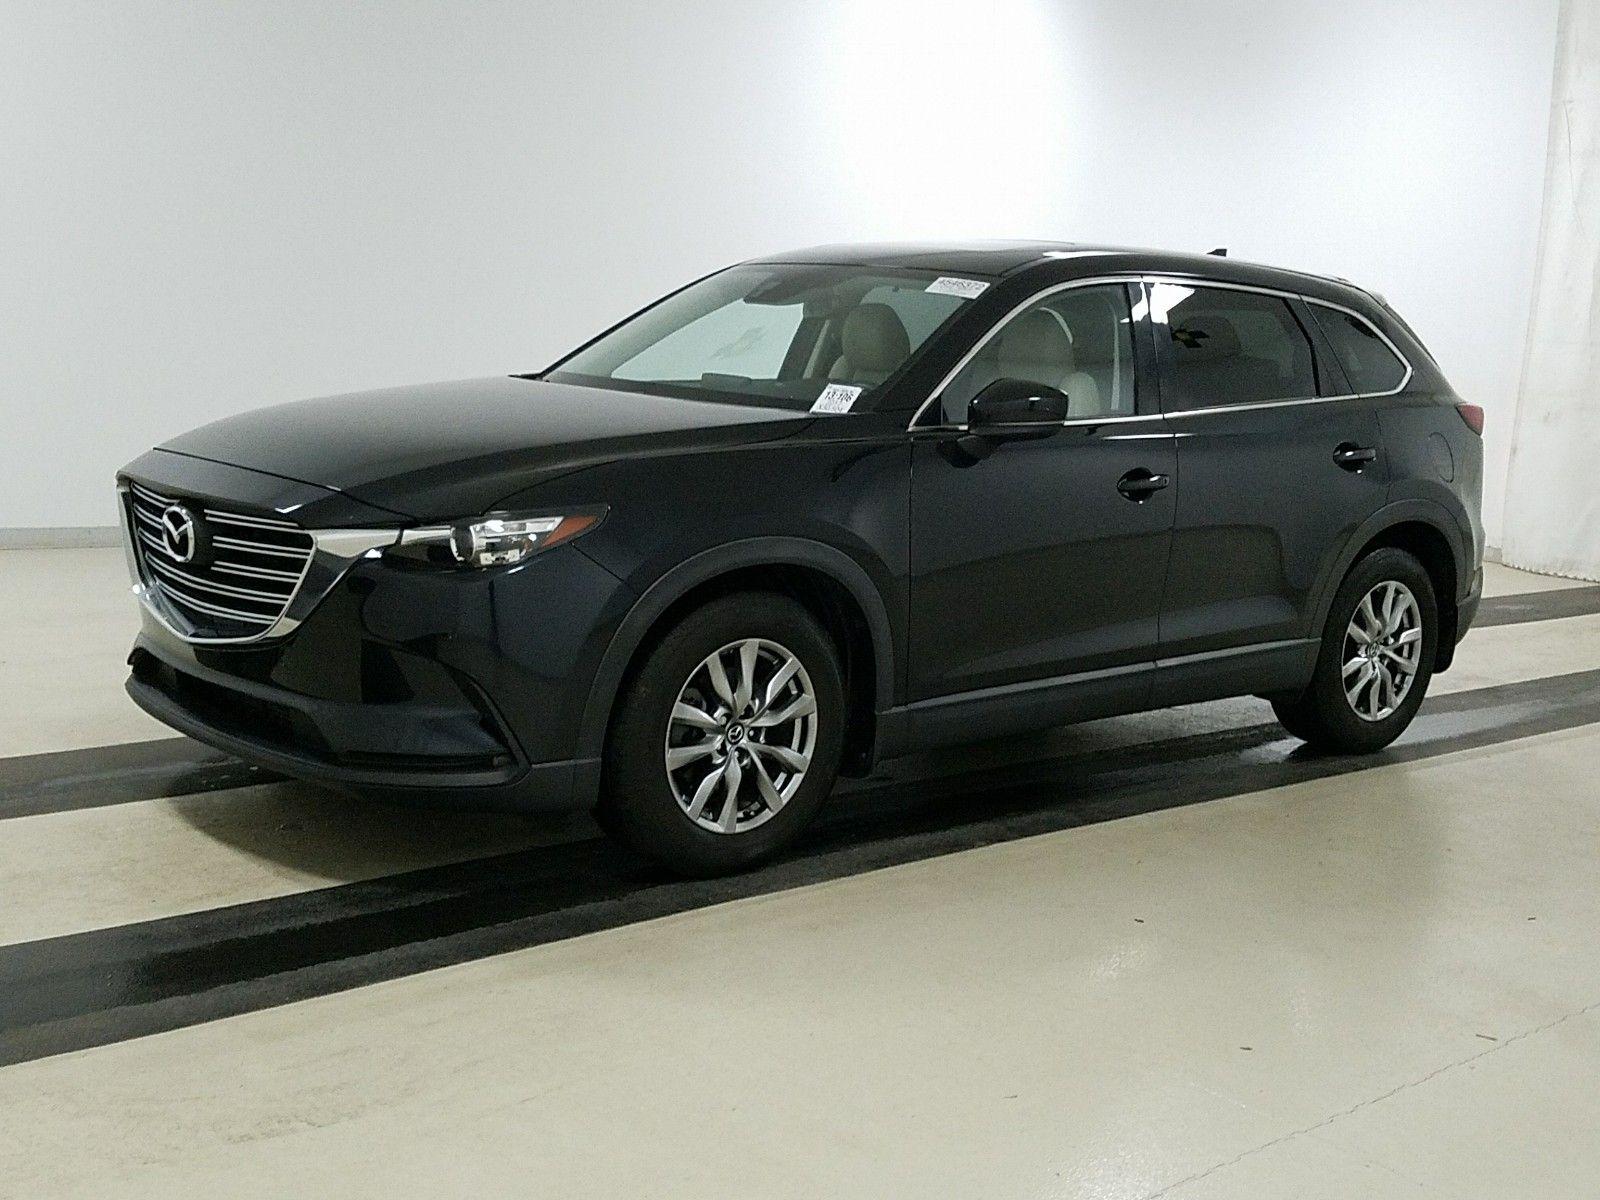 2017 Mazda Cx-9 2.5. Lot 99915993979 Vin JM3TCACY3H0135276